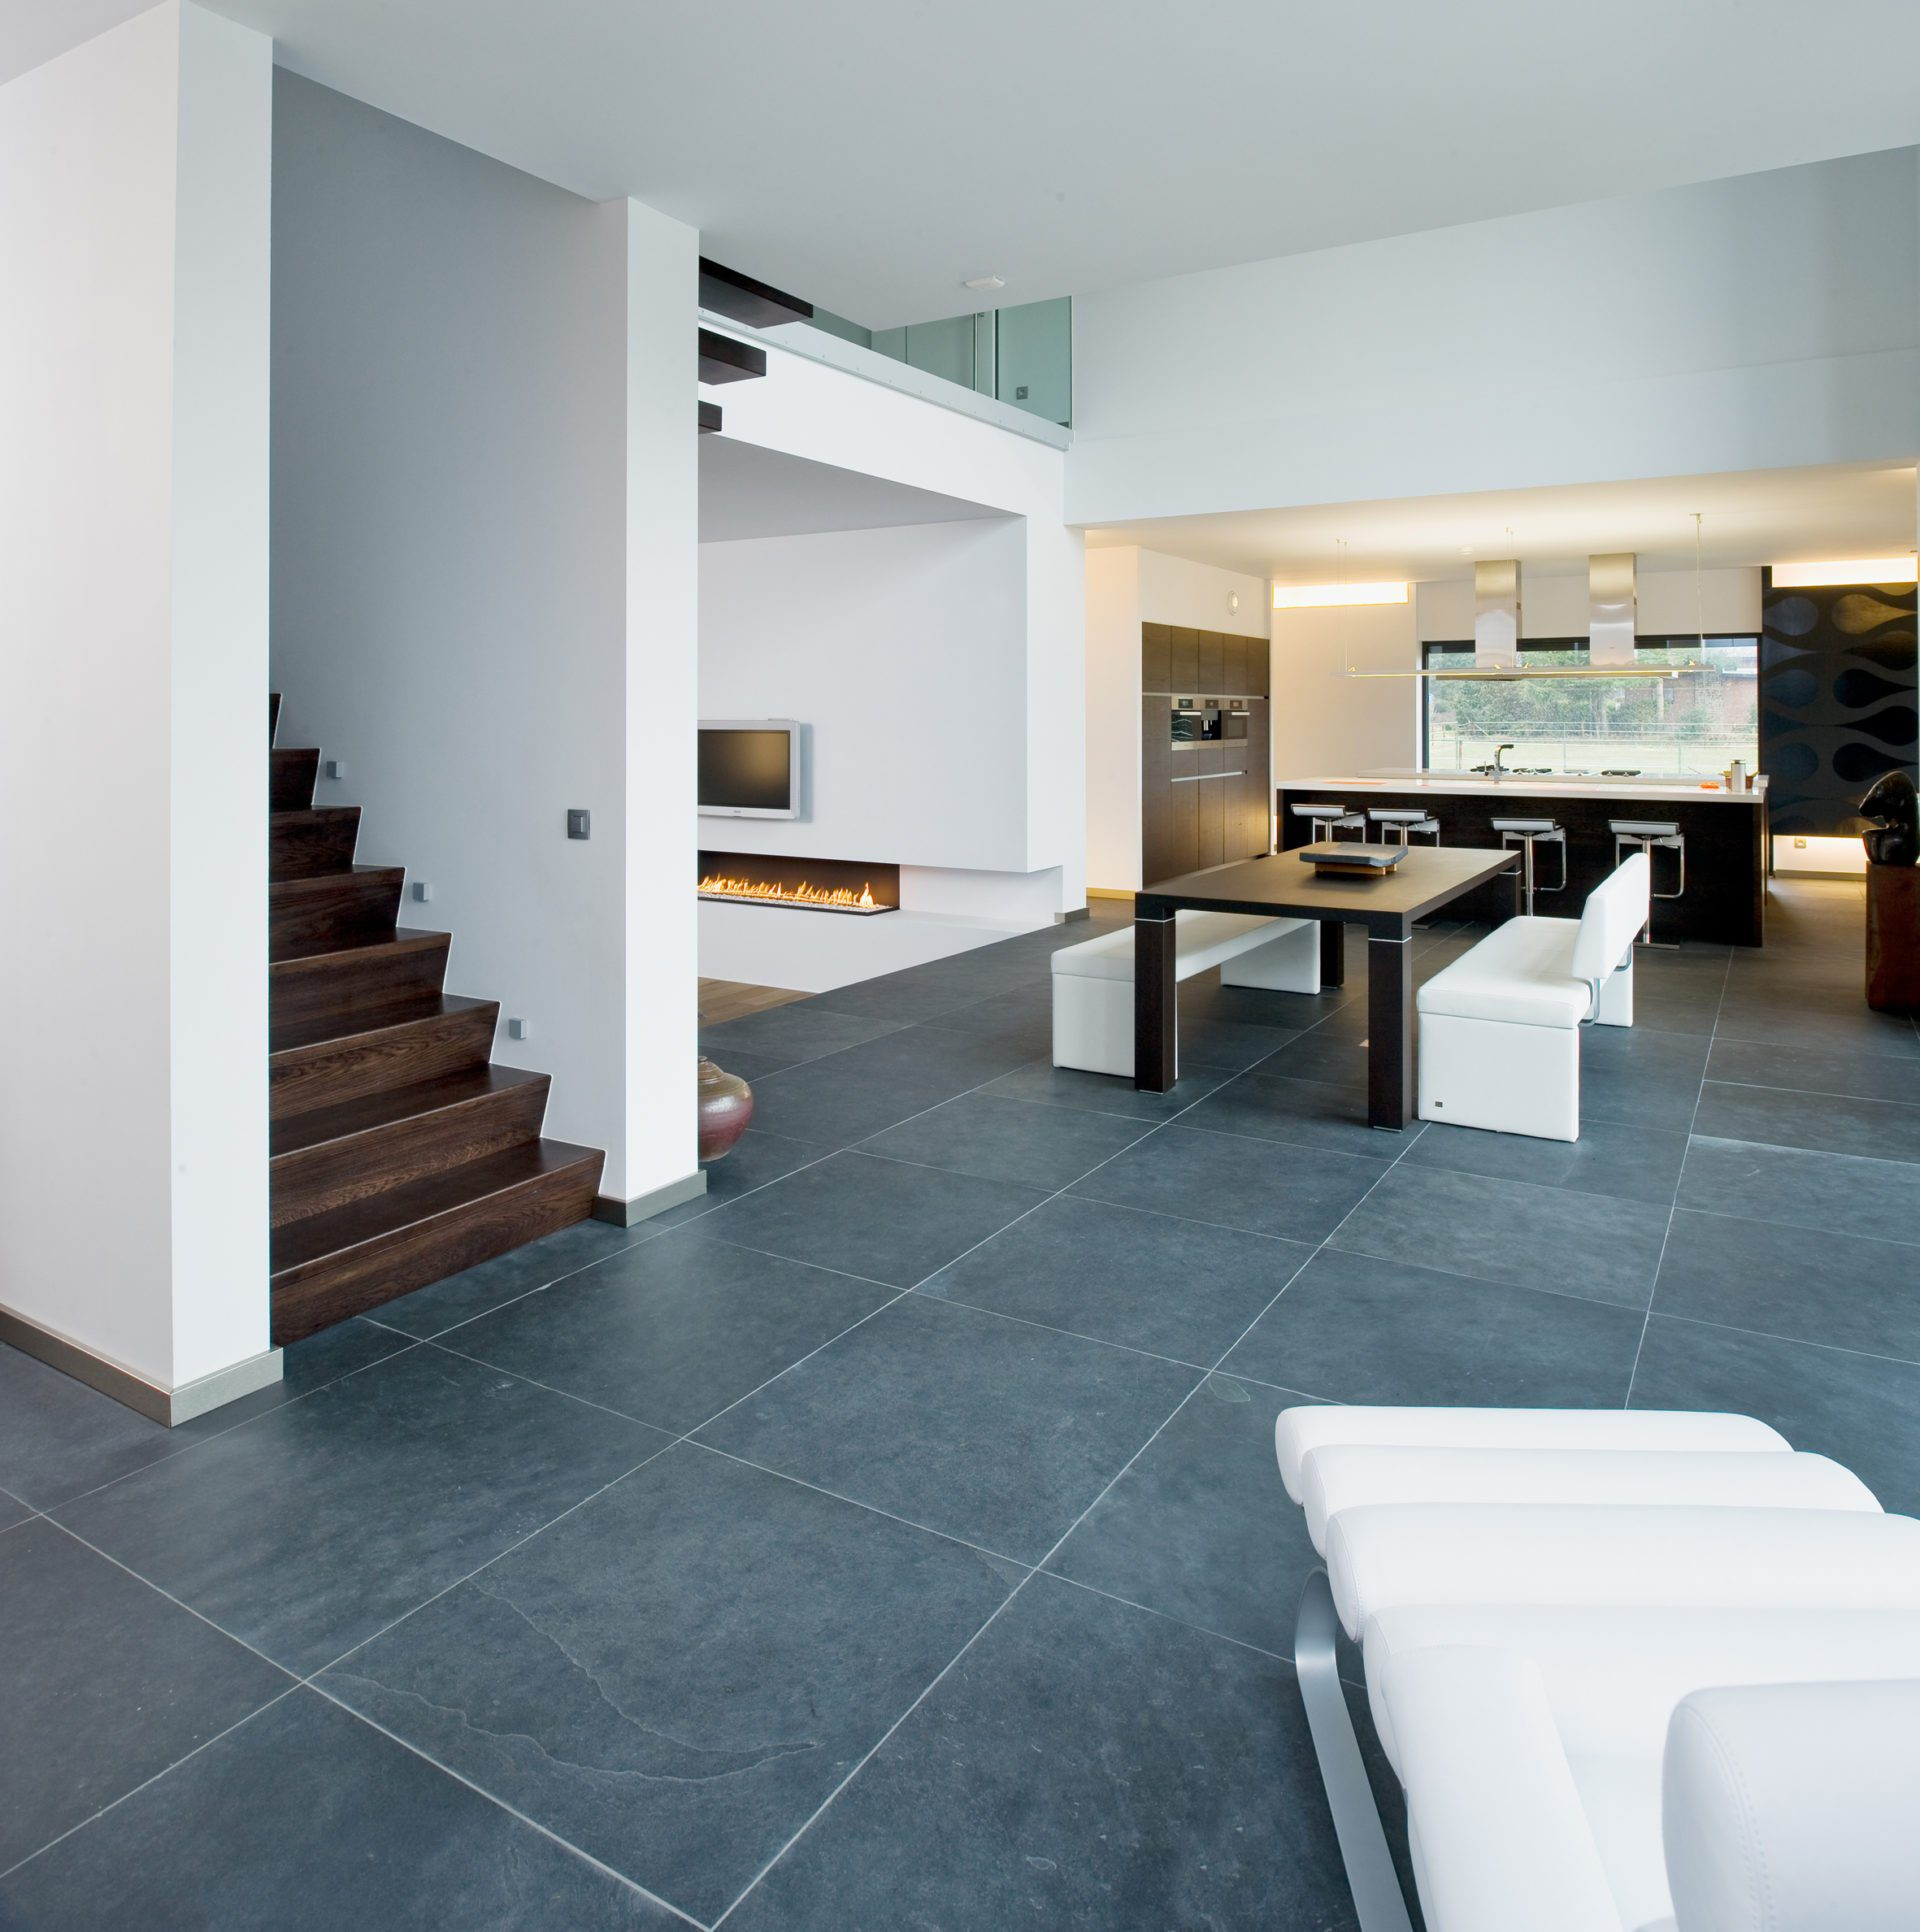 Glaswand In De Badkamer ~ Moderne woonkamer tegels  Leisteen vloer prachtige leistenen tegels